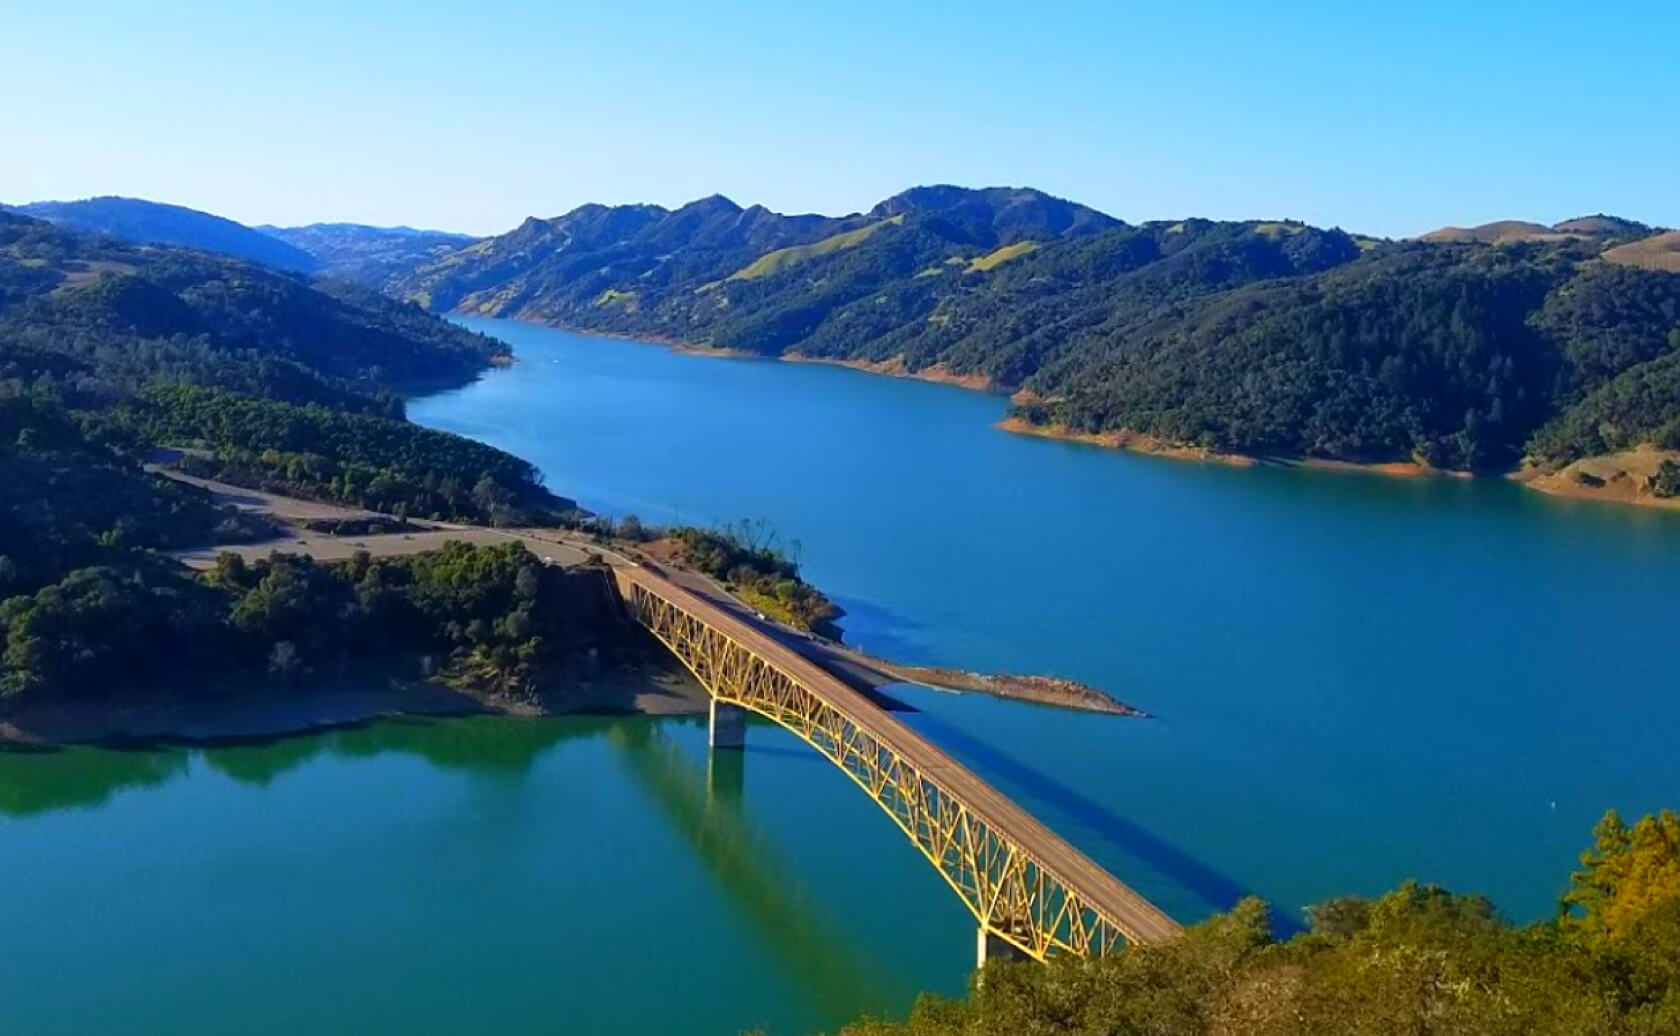 Sonoma-Lake-Fishing-Guide-Report-California-03